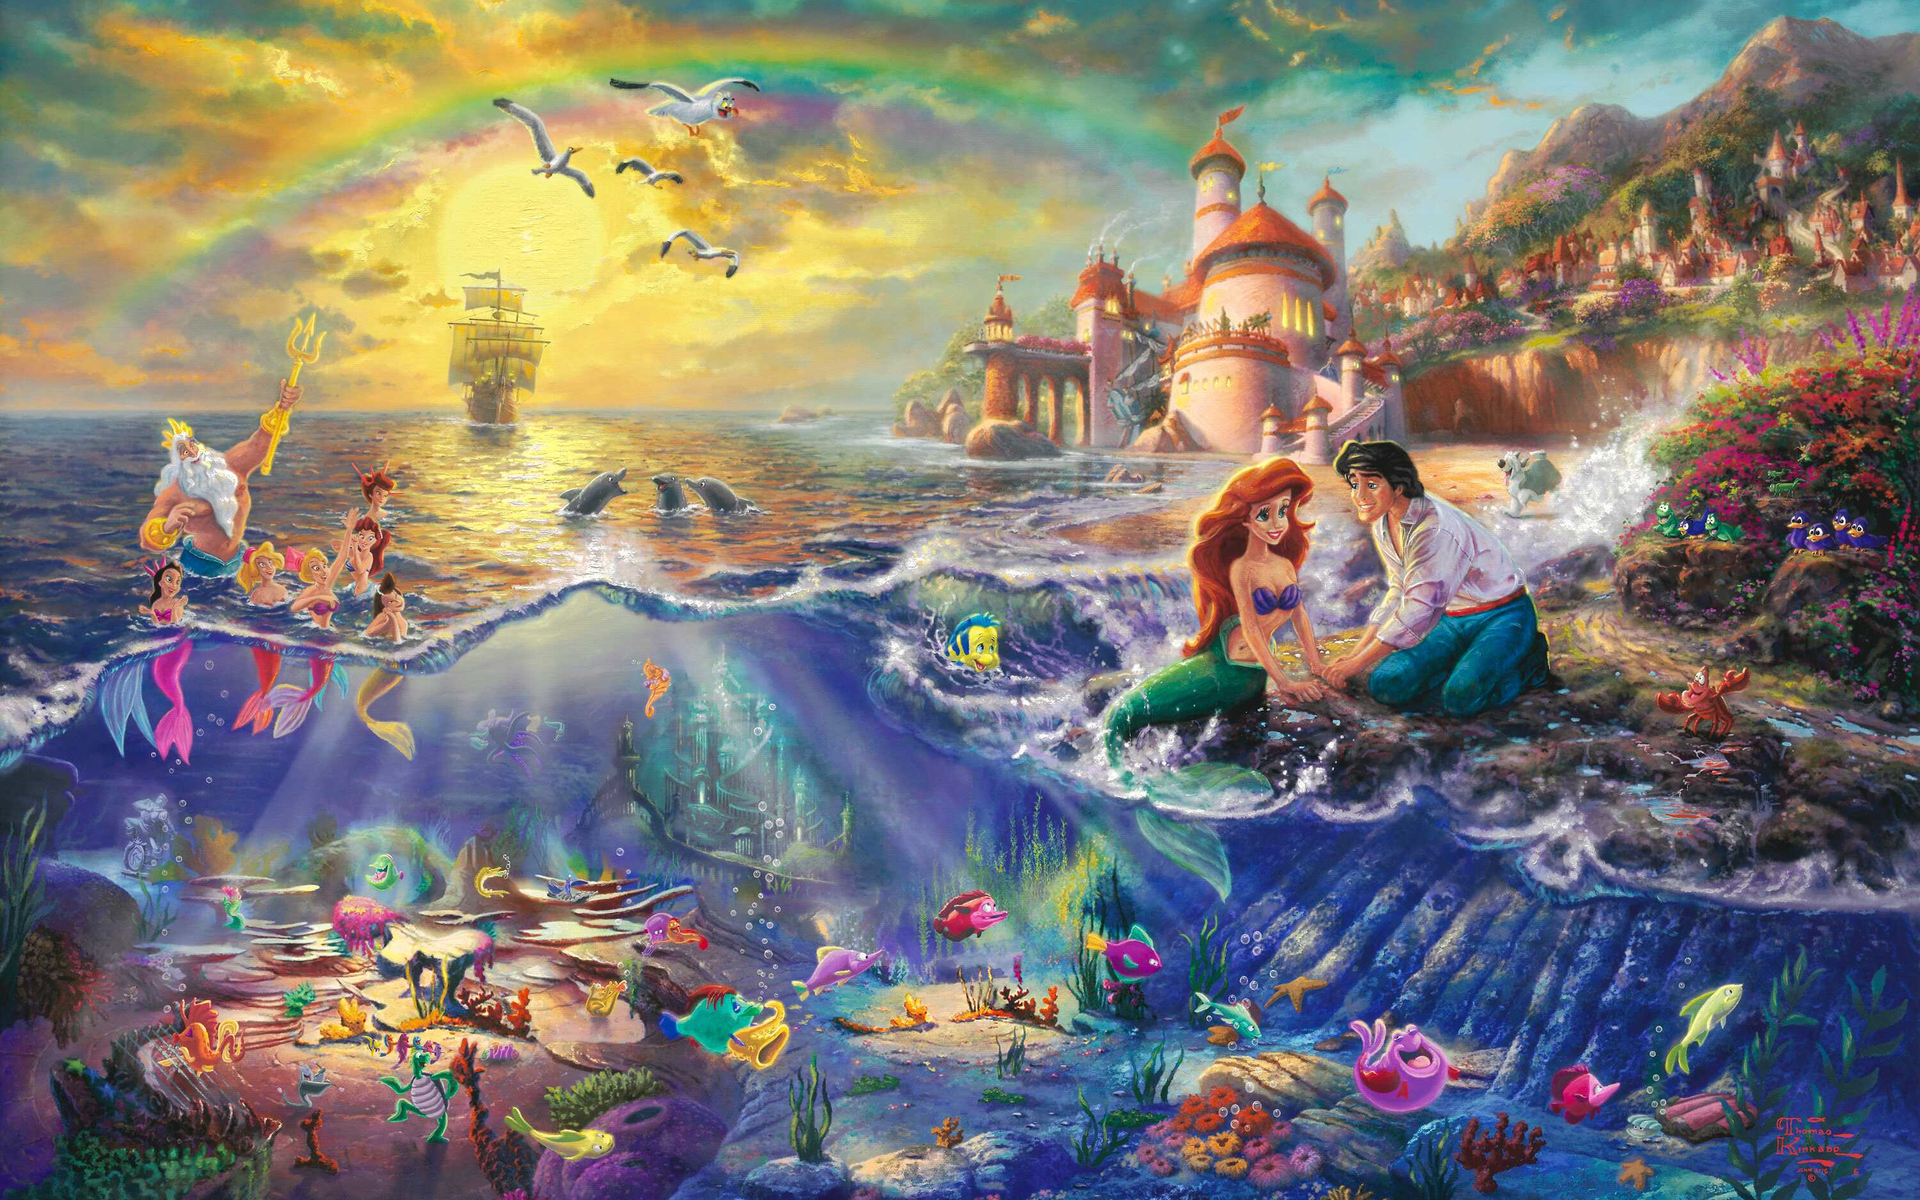 50 Little Mermaid Wallpaper Iphone On Wallpapersafari